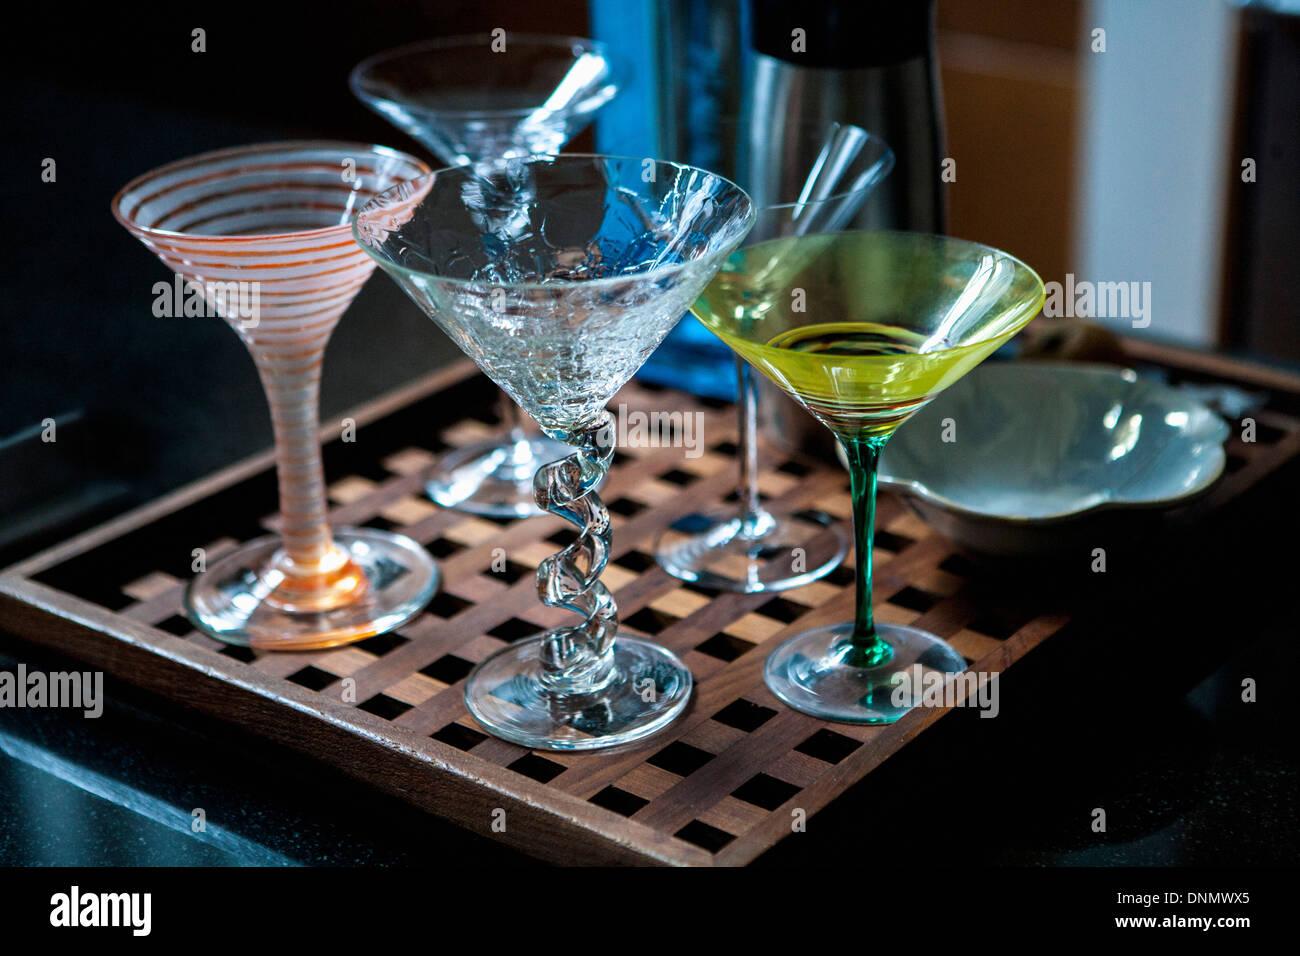 Assortment of Martini Glasses - Stock Image